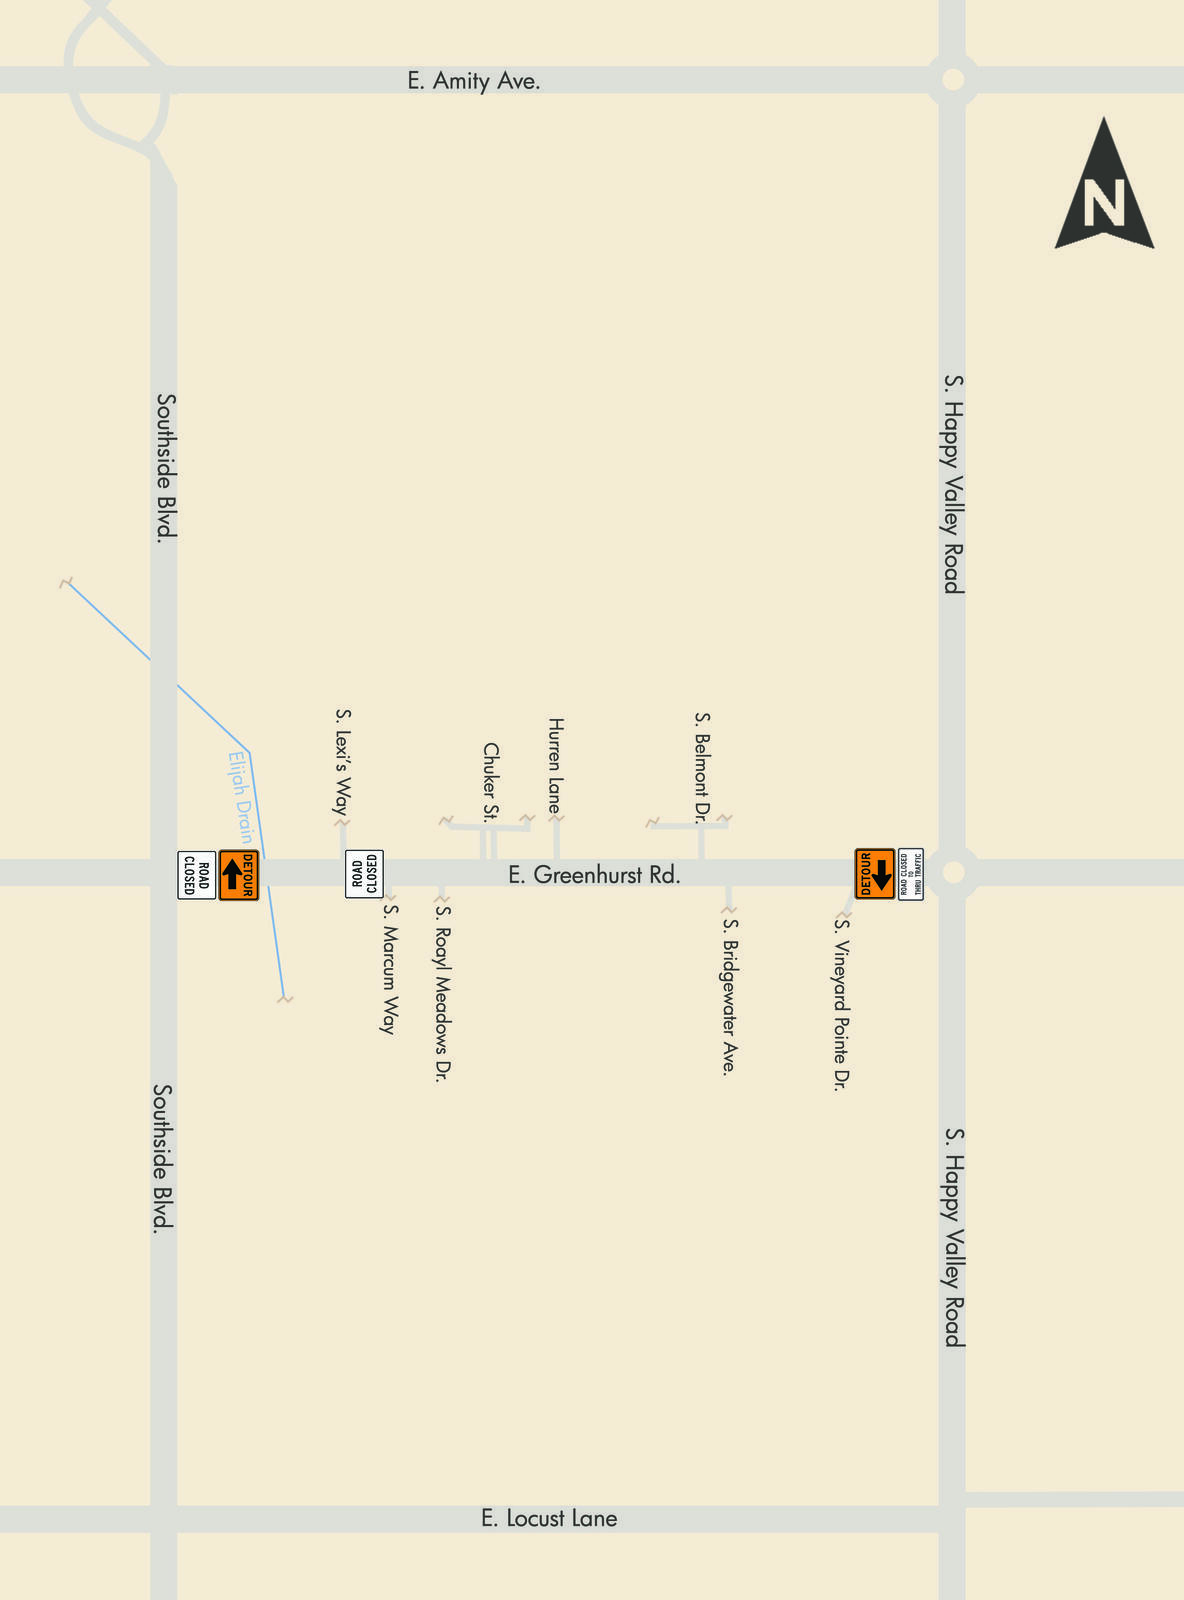 Greenhurst Road (btwn Southside Blvd & Marcum Way) will be closed to